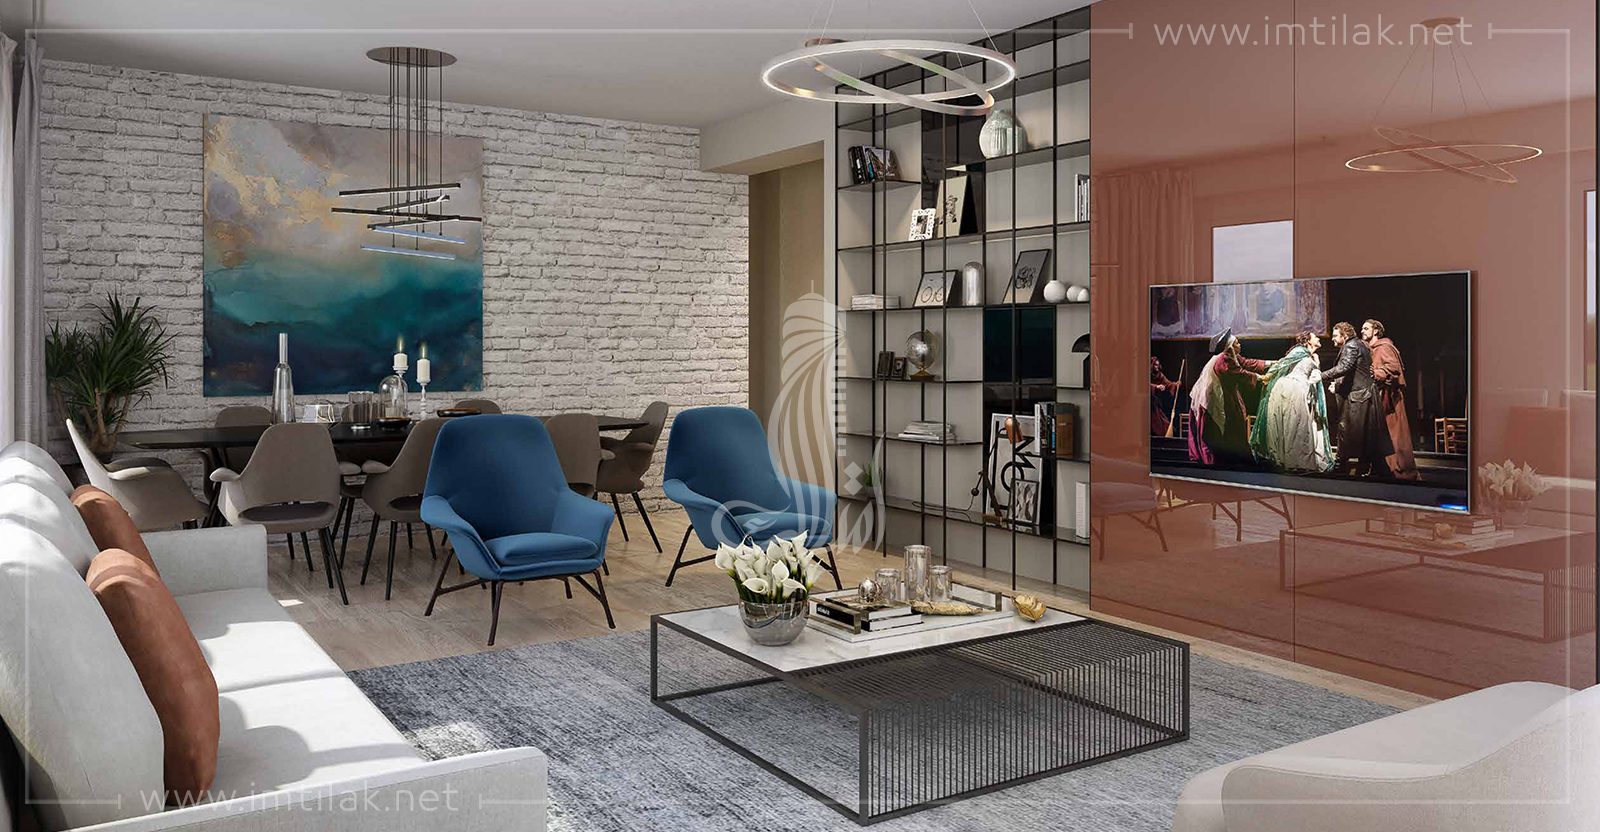 Antalya Project  IMT - 750